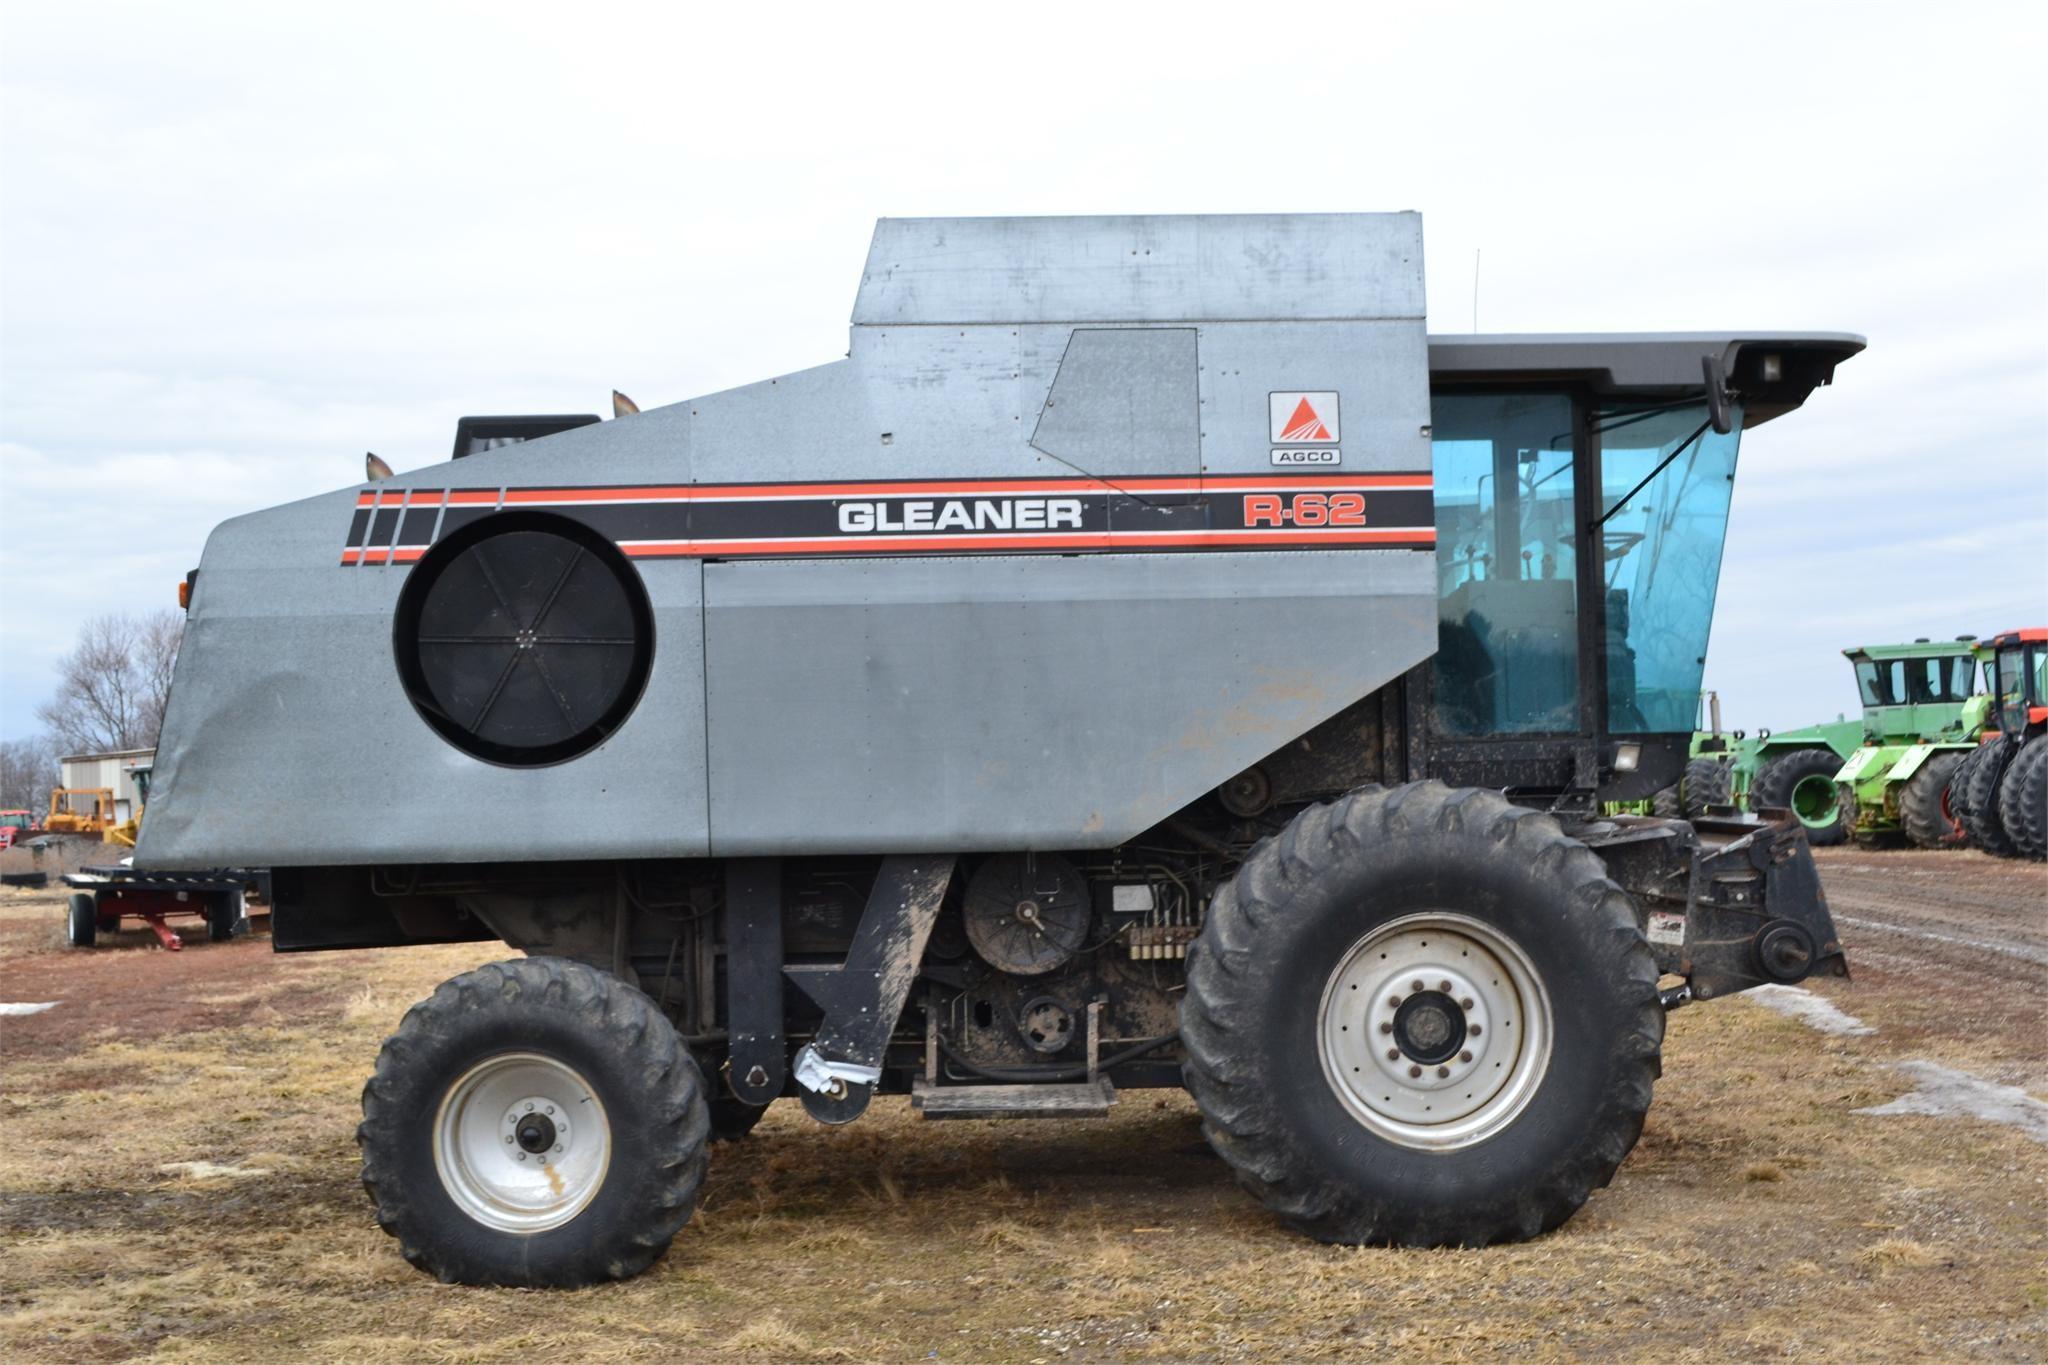 1994 Gleaner R62 Combine